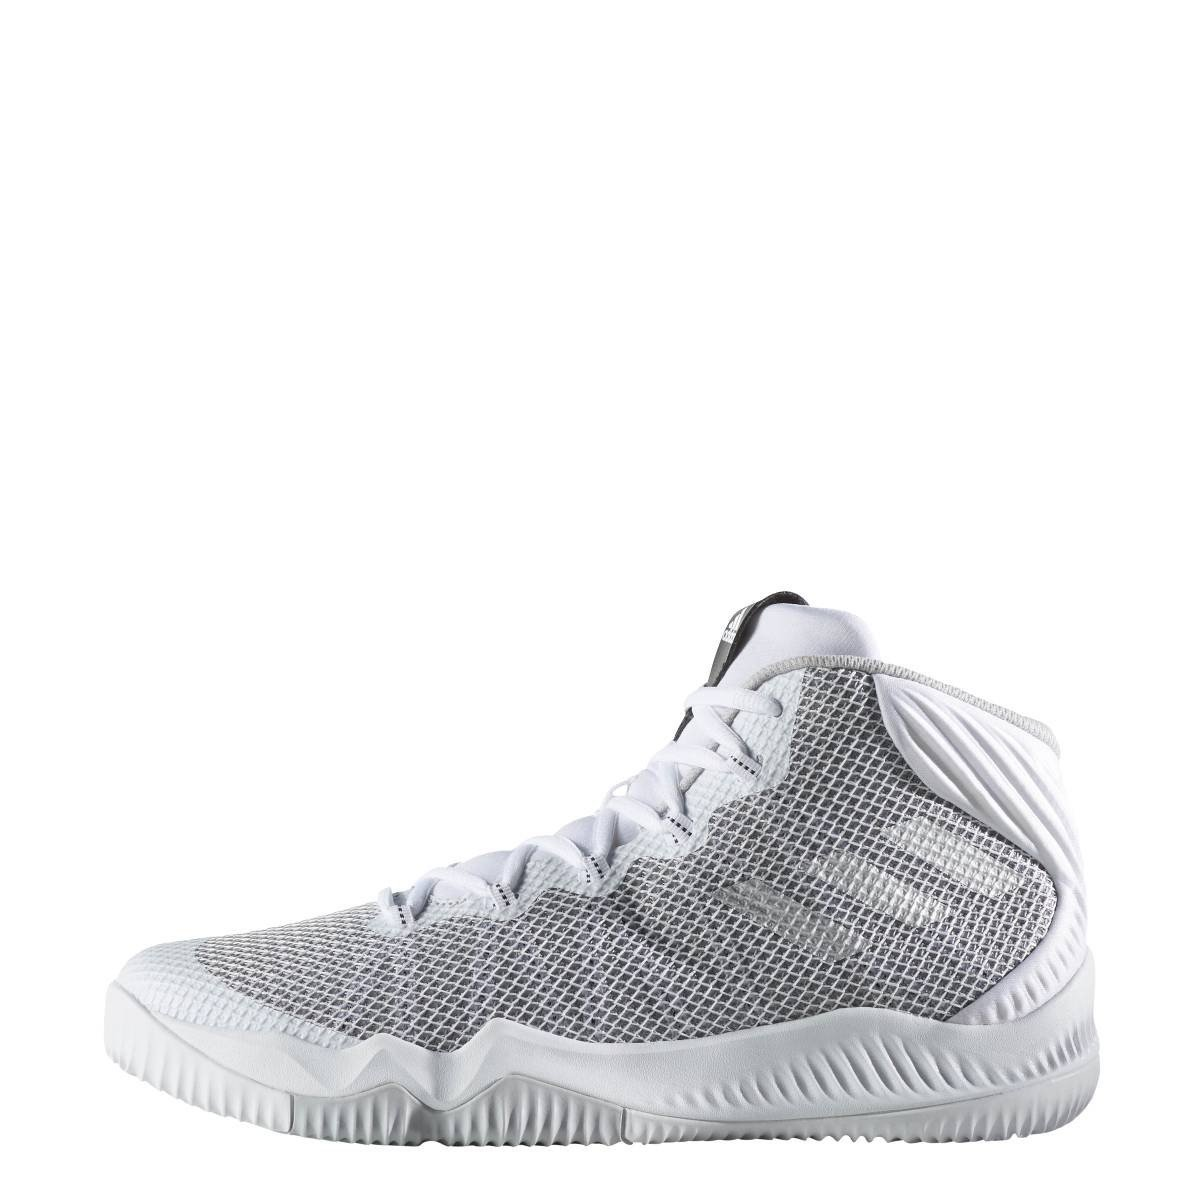 adidas Crazy Hustle Scarpe da Basket Uomo, Bianco (Ftwbla